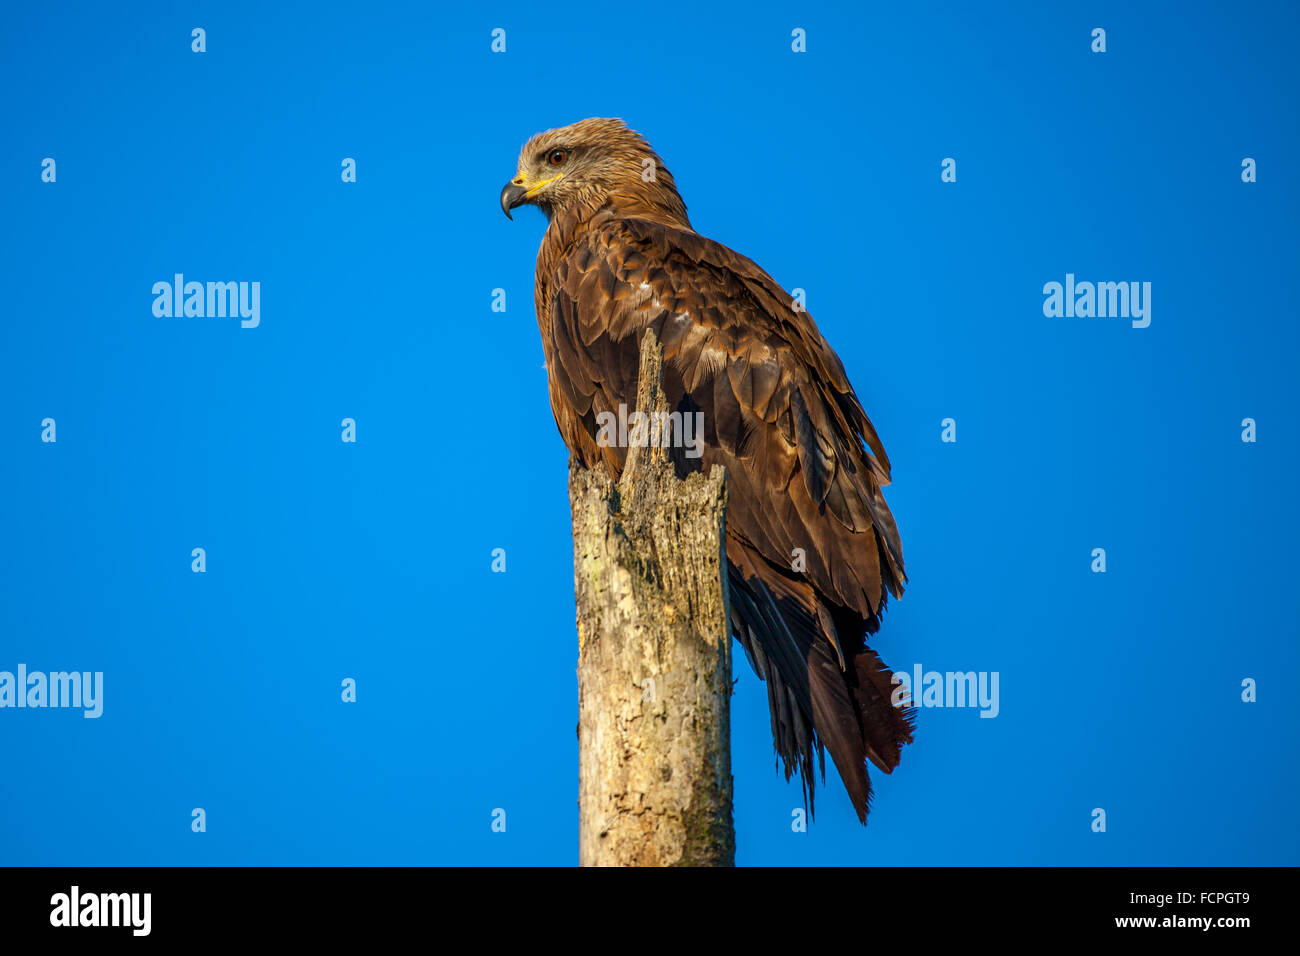 Kite (Milvus migrans) - Stock Image